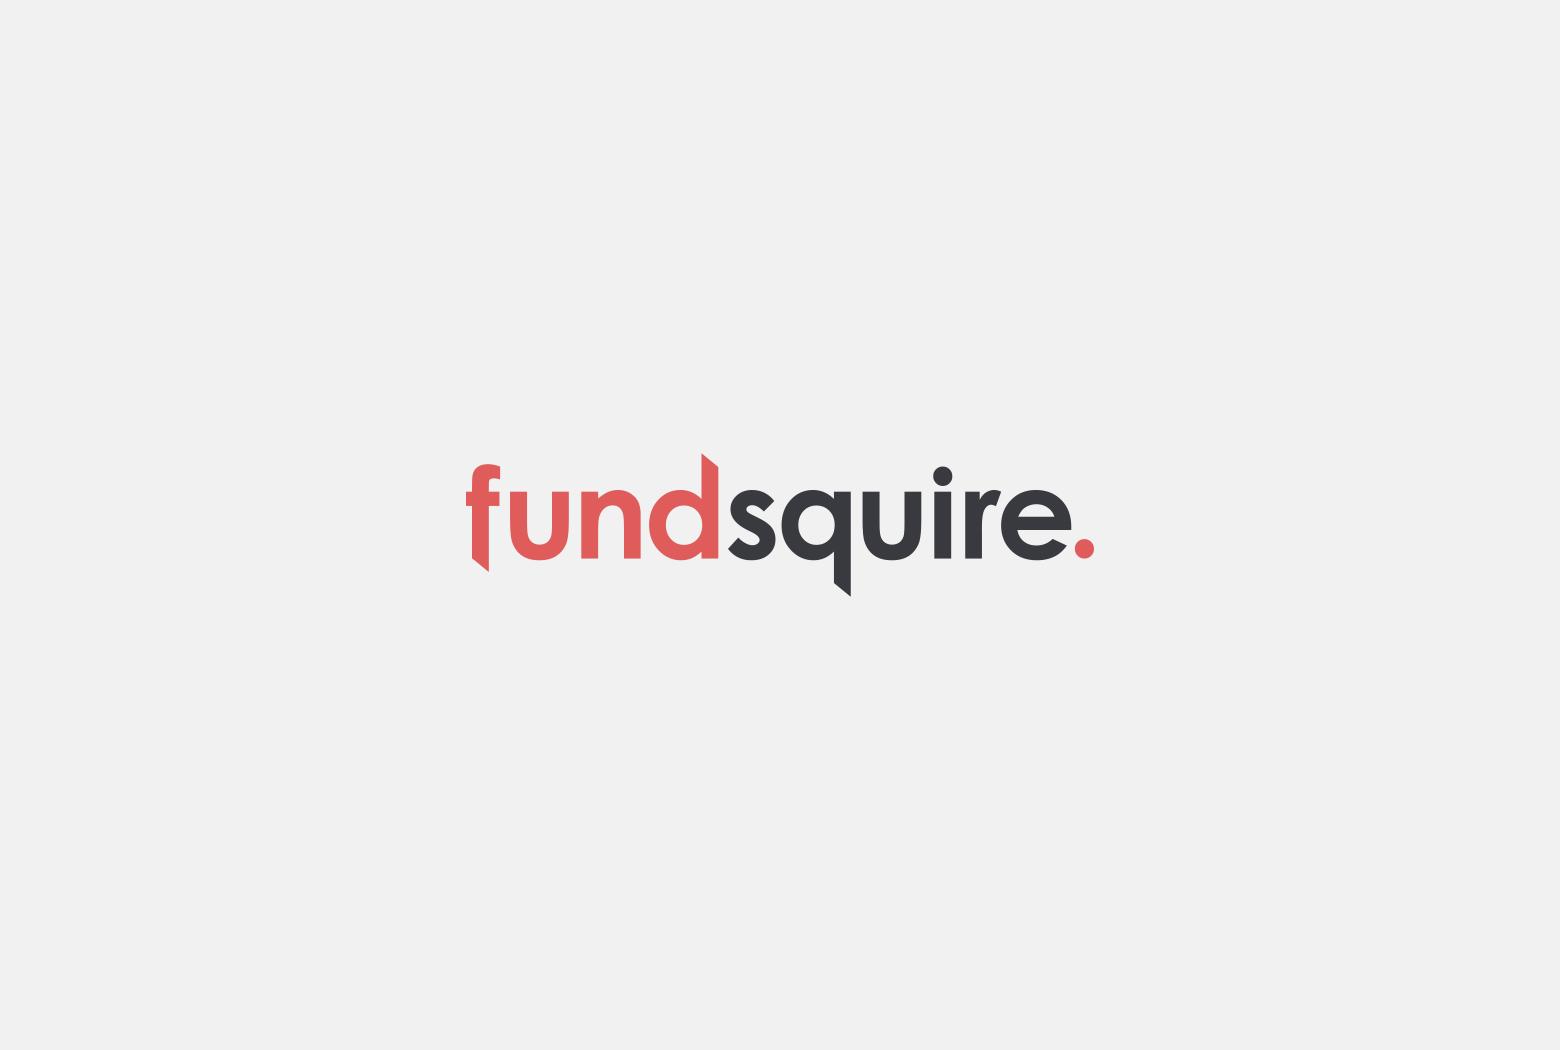 Nectar-&-Co-Fundsquire-Logo-Design.jpg